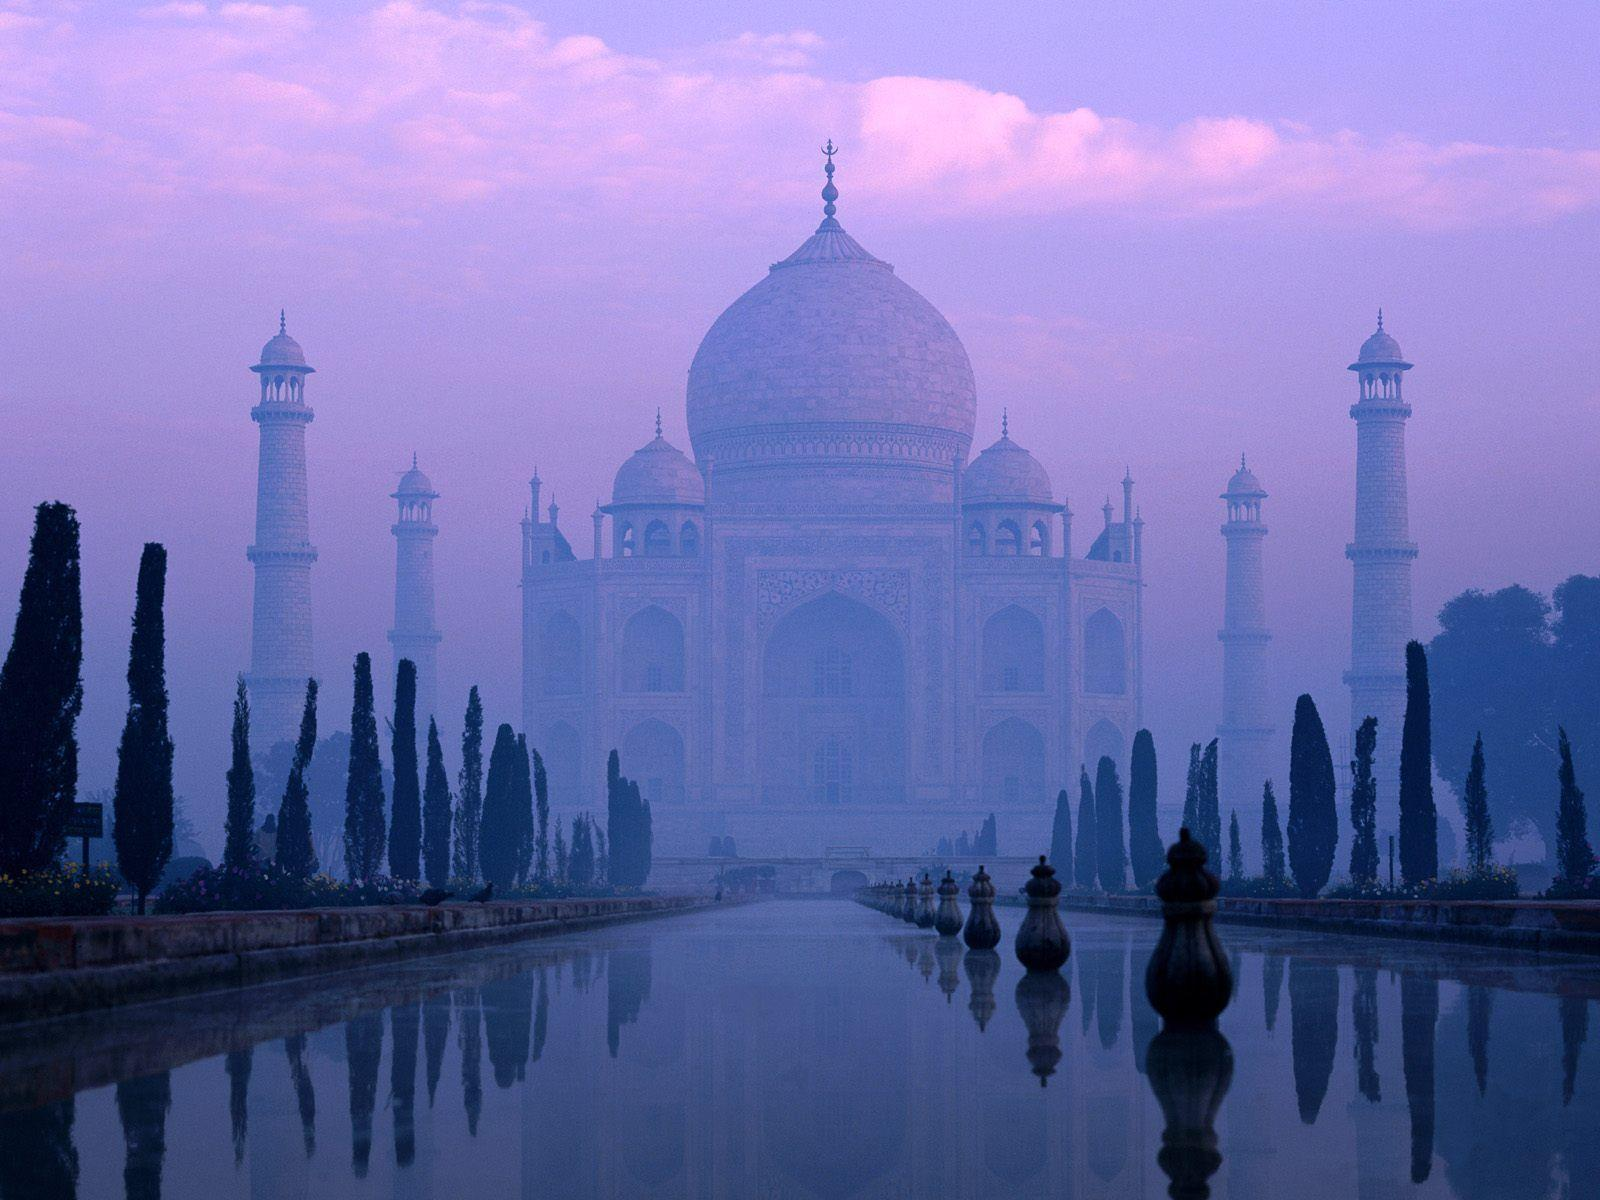 World Famous Places Wallpapers - Taj Mahal - Agra - India - Free ...